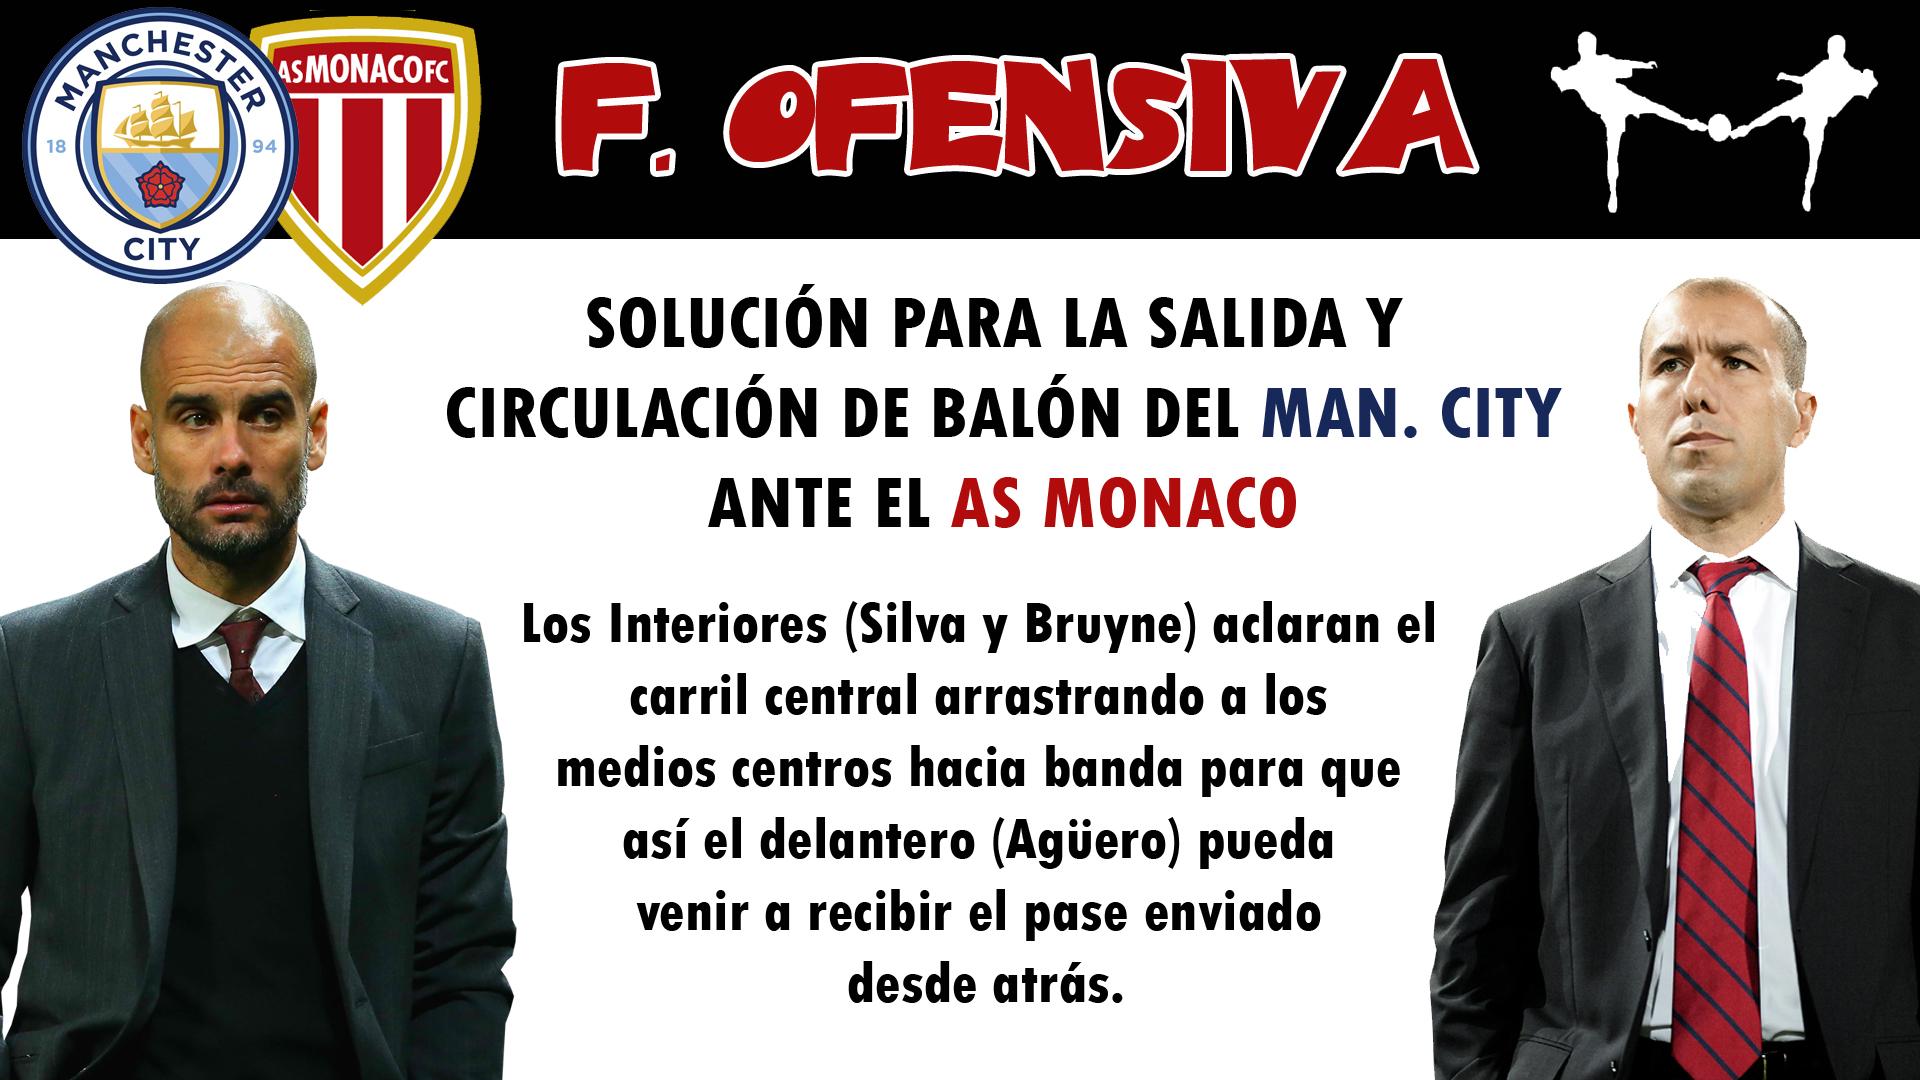 futbolcarrasco guardiola manchester city citicien jardim monaco champions league entrenador análisis táctico